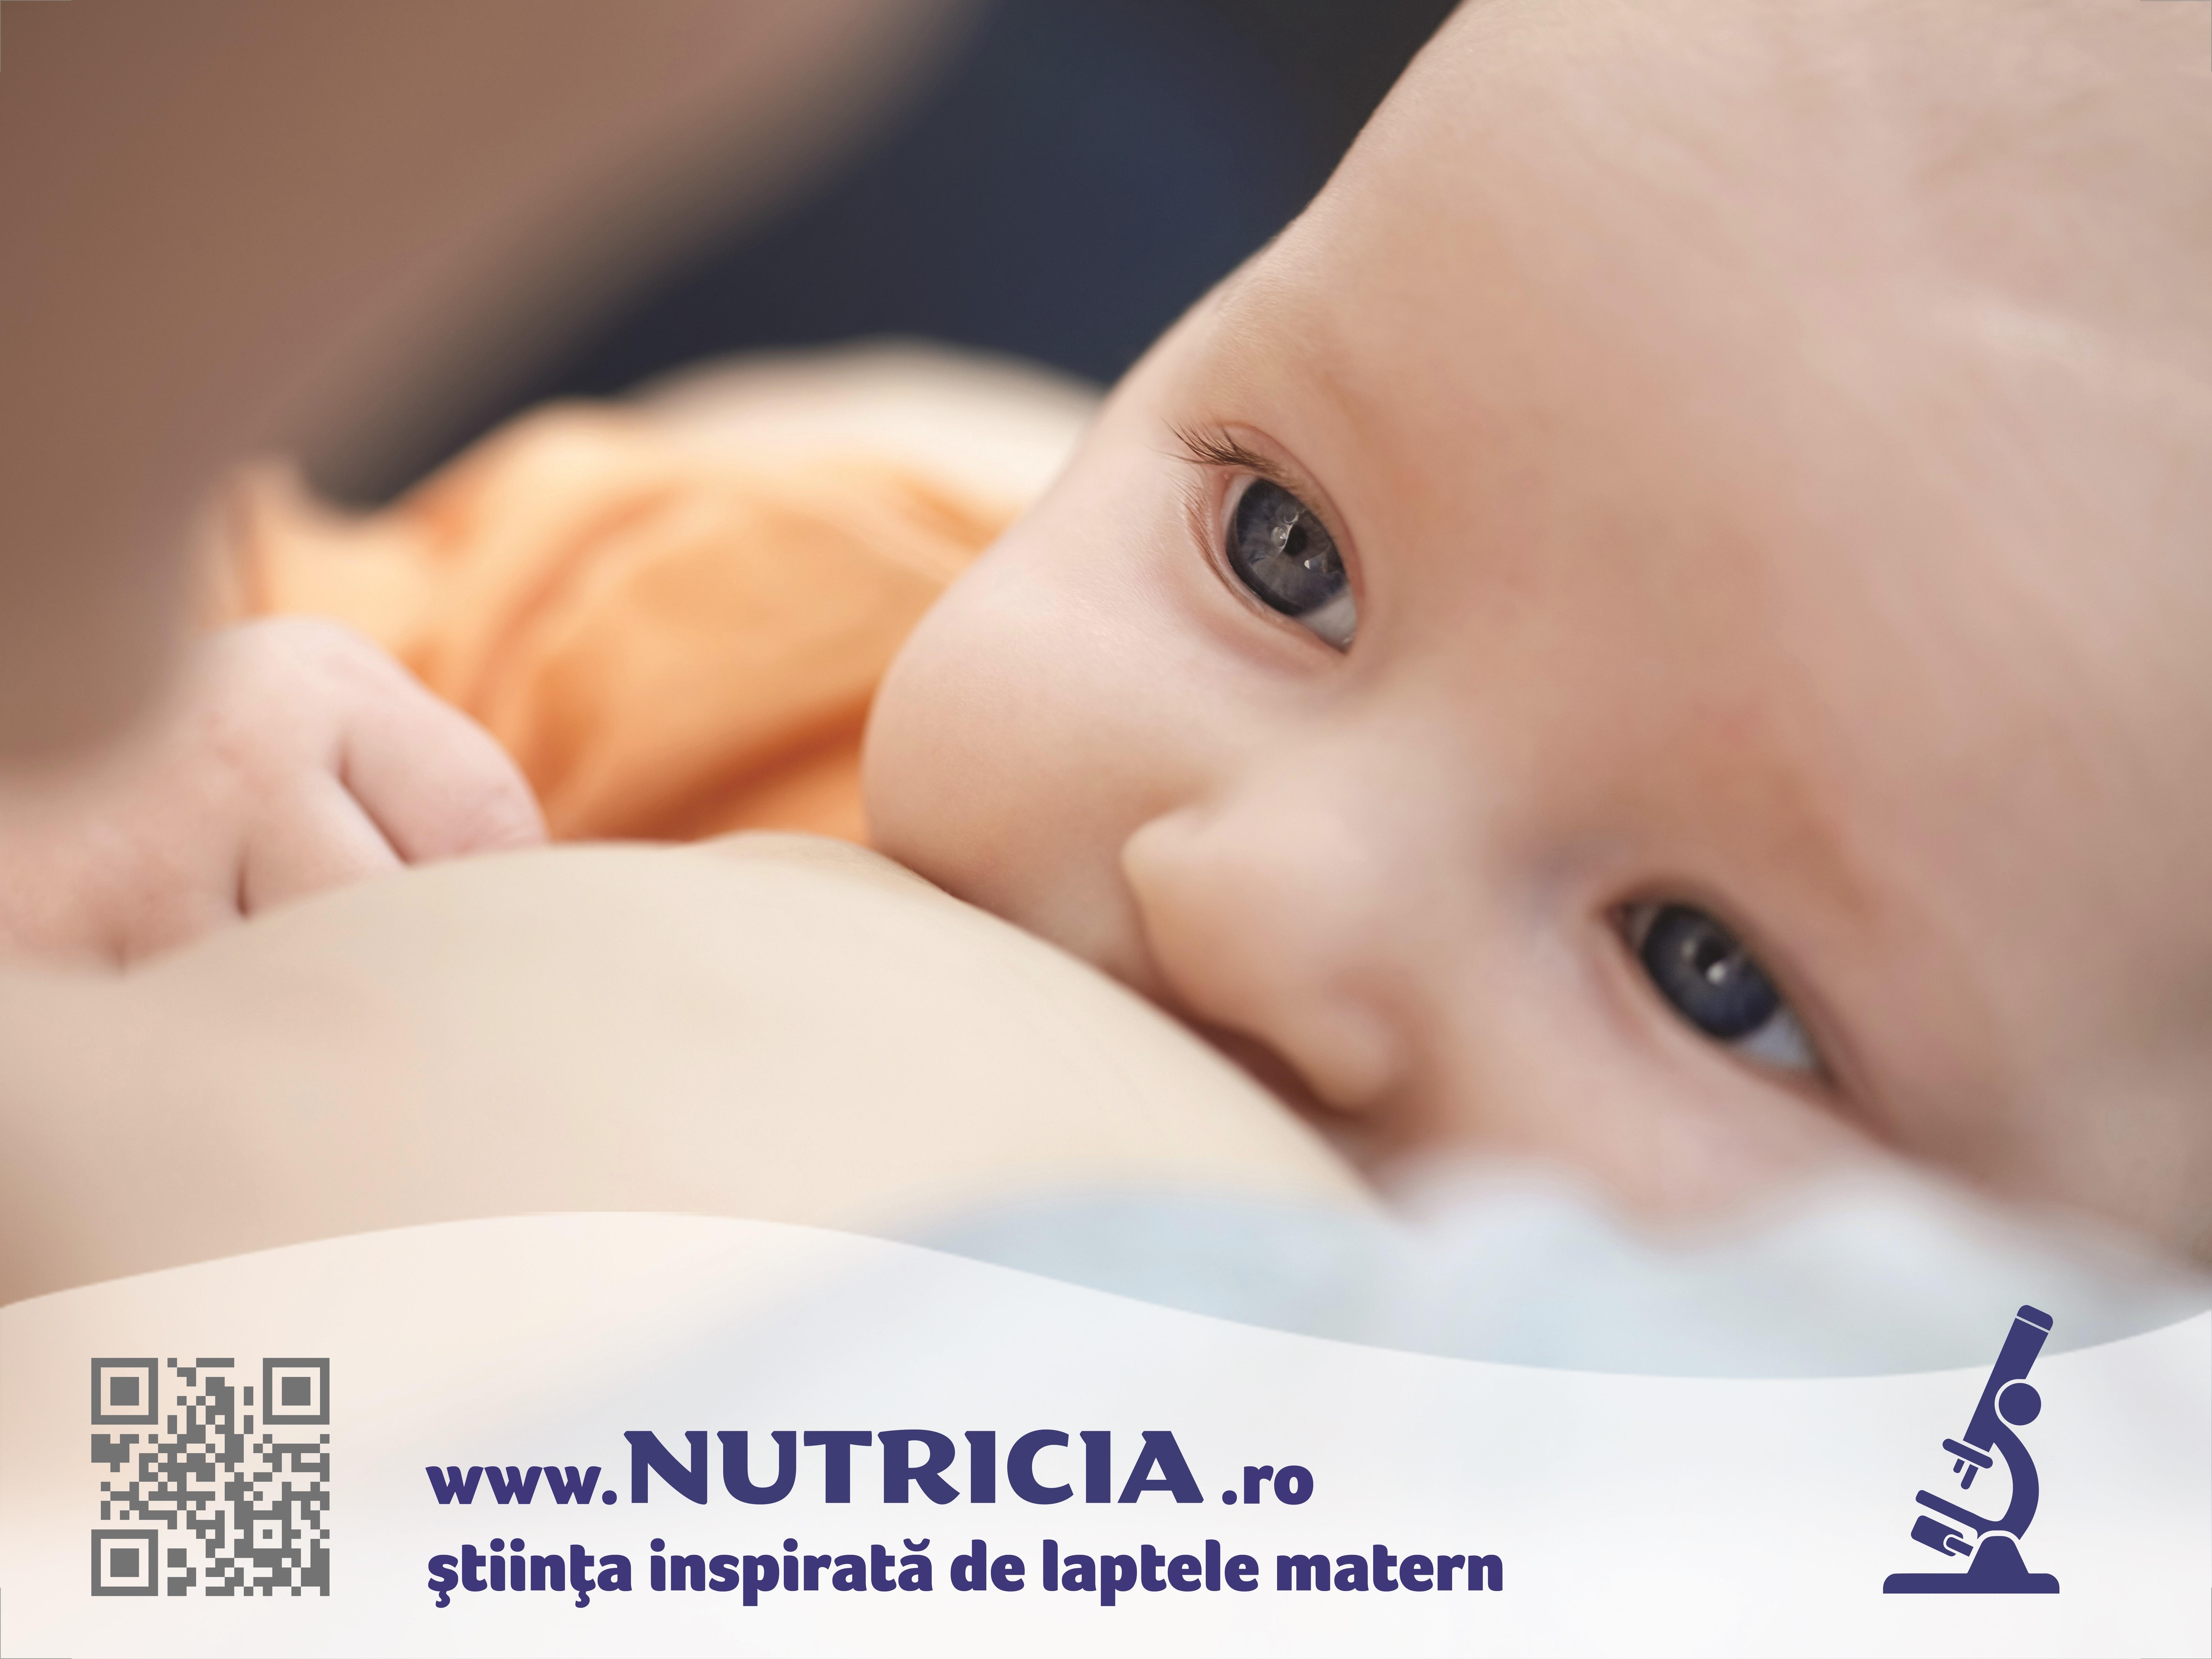 Aptanutricia